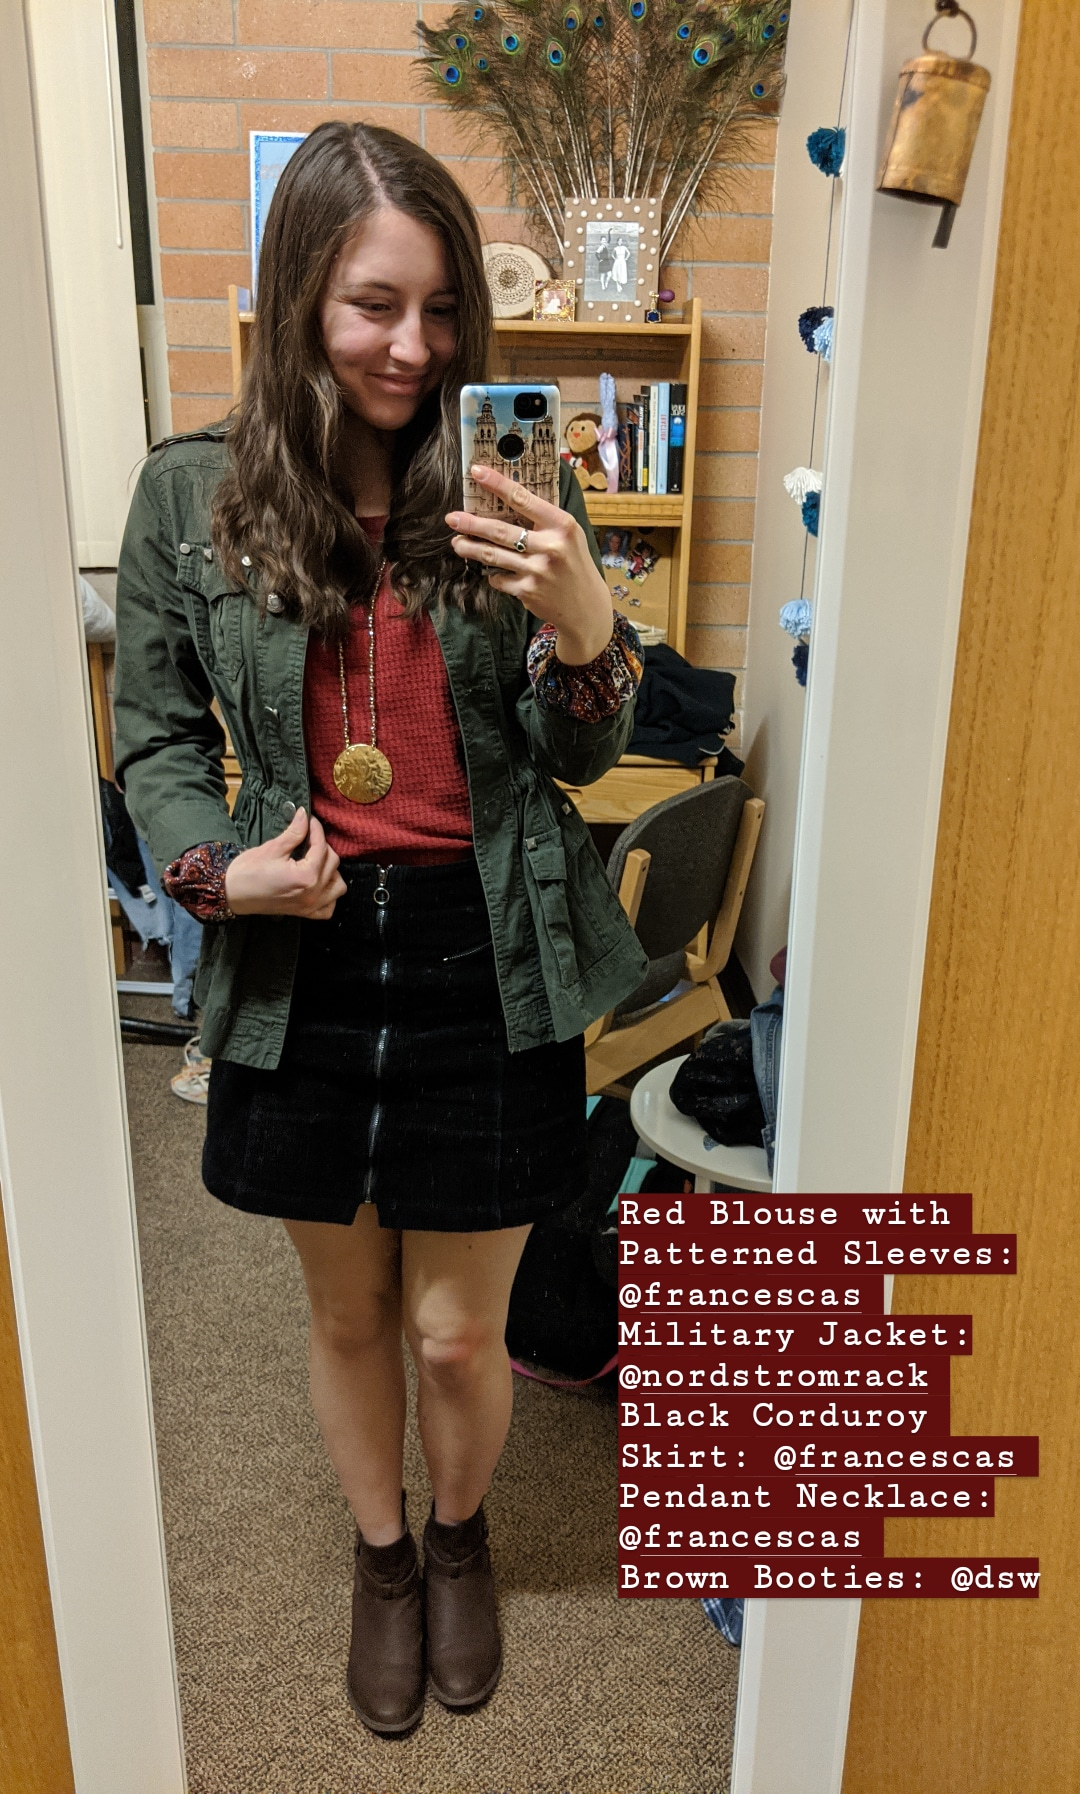 red blouse, military jacket, black corduroy skirt